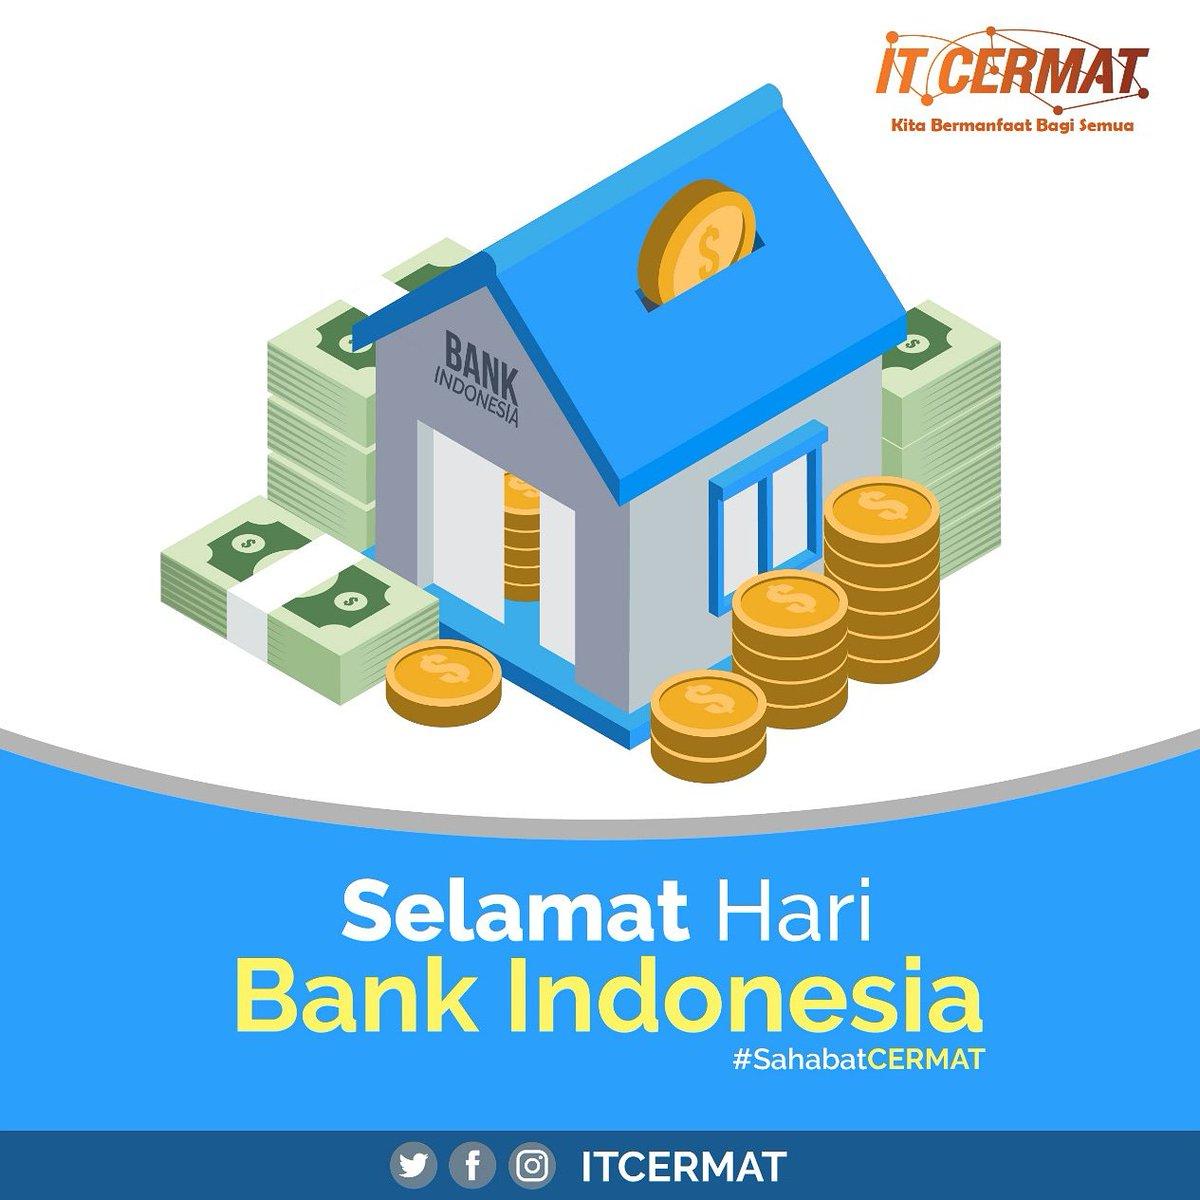 Selamat Hari Bank Indonesia🏦   #itcermat #haribankindonesia #pelatihangratis #RZ #RahmawatiDzaelani